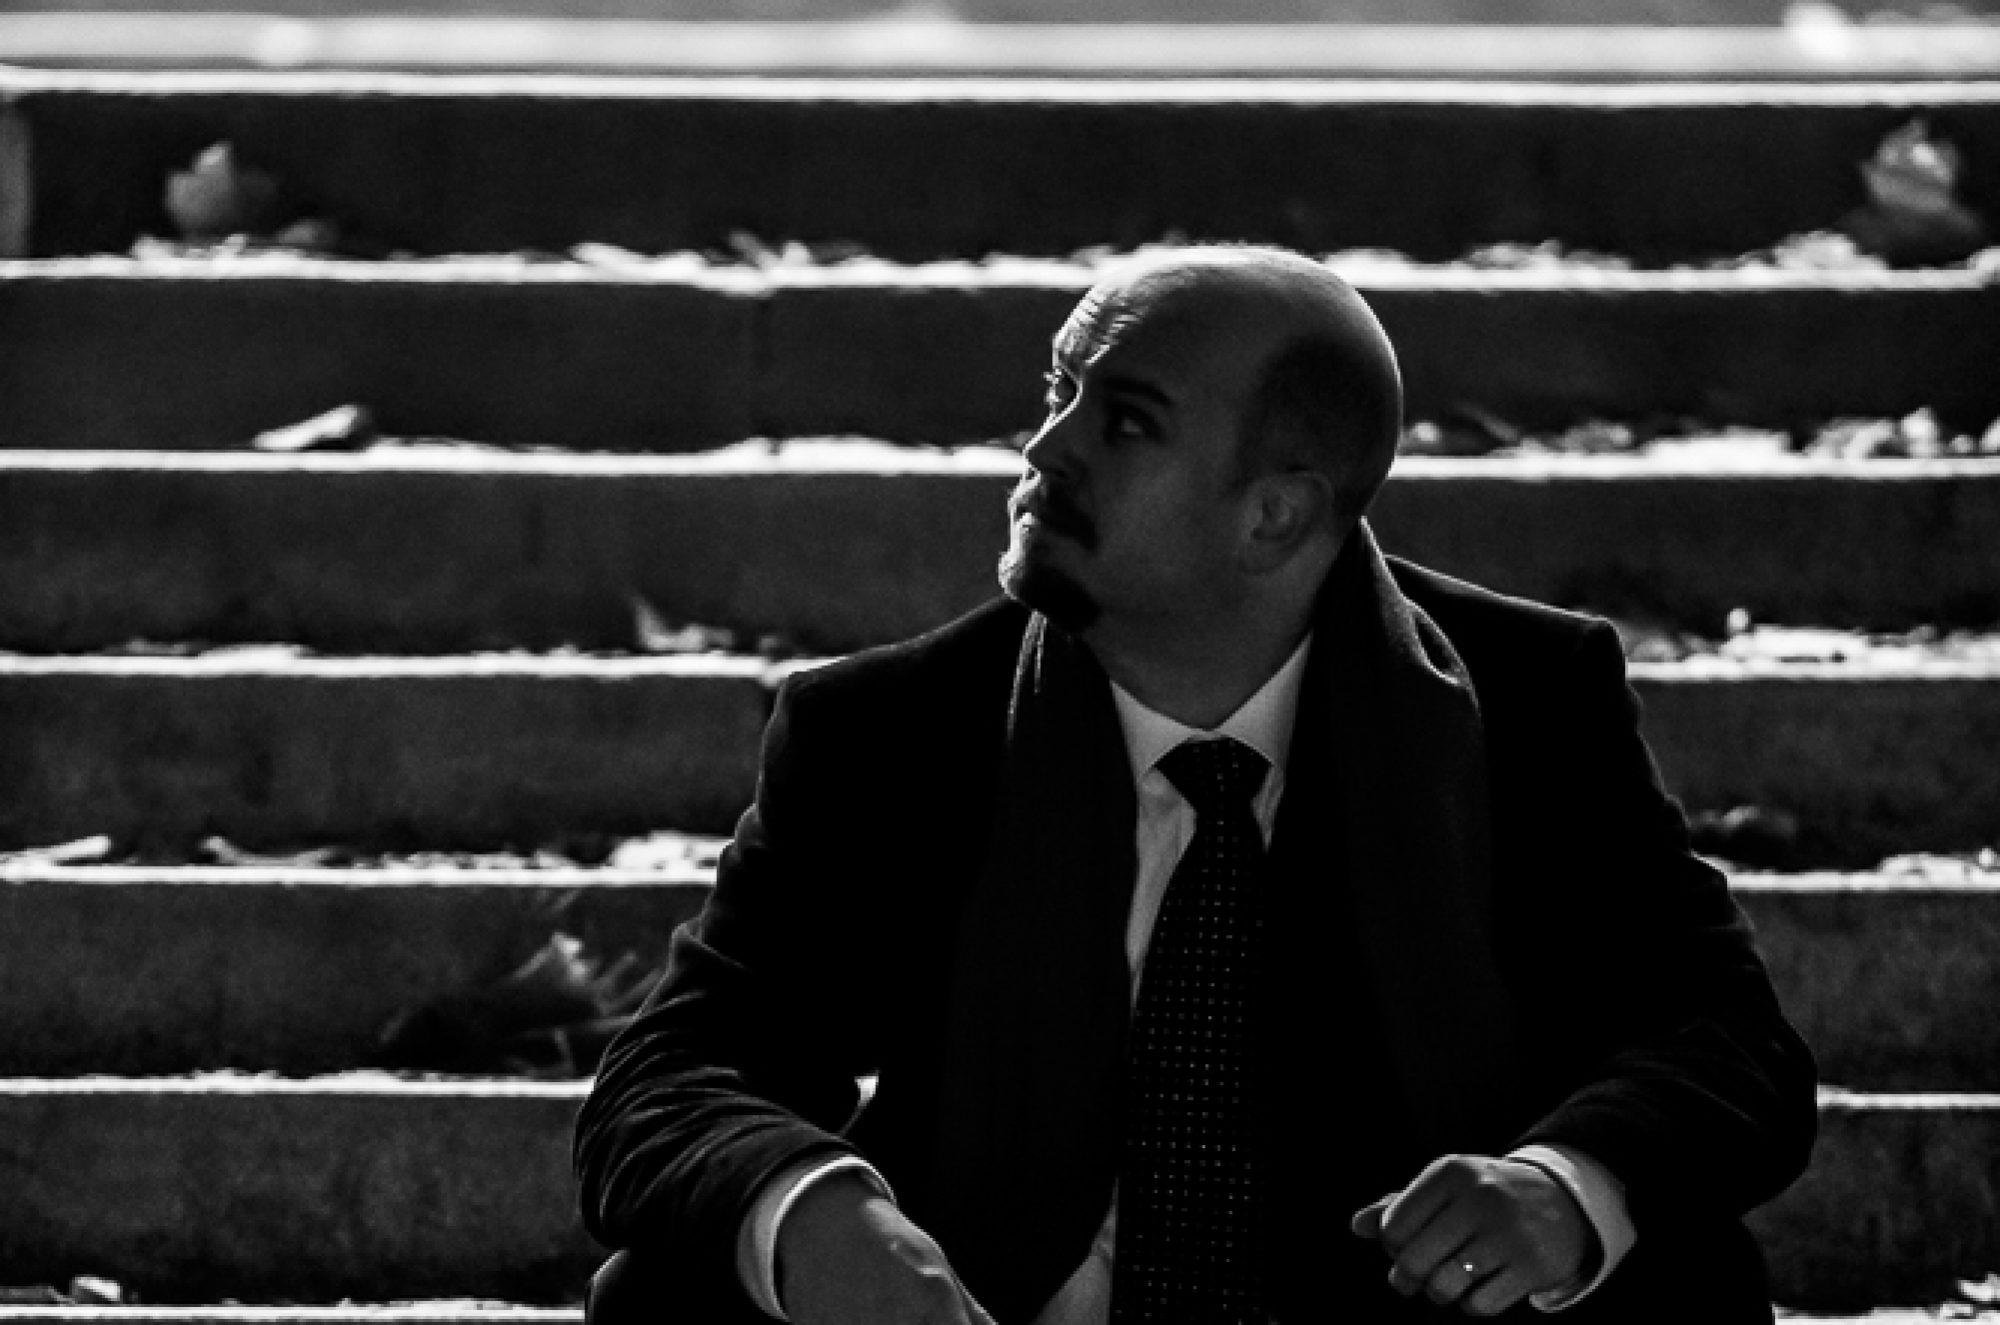 David Björkman - Dirigent